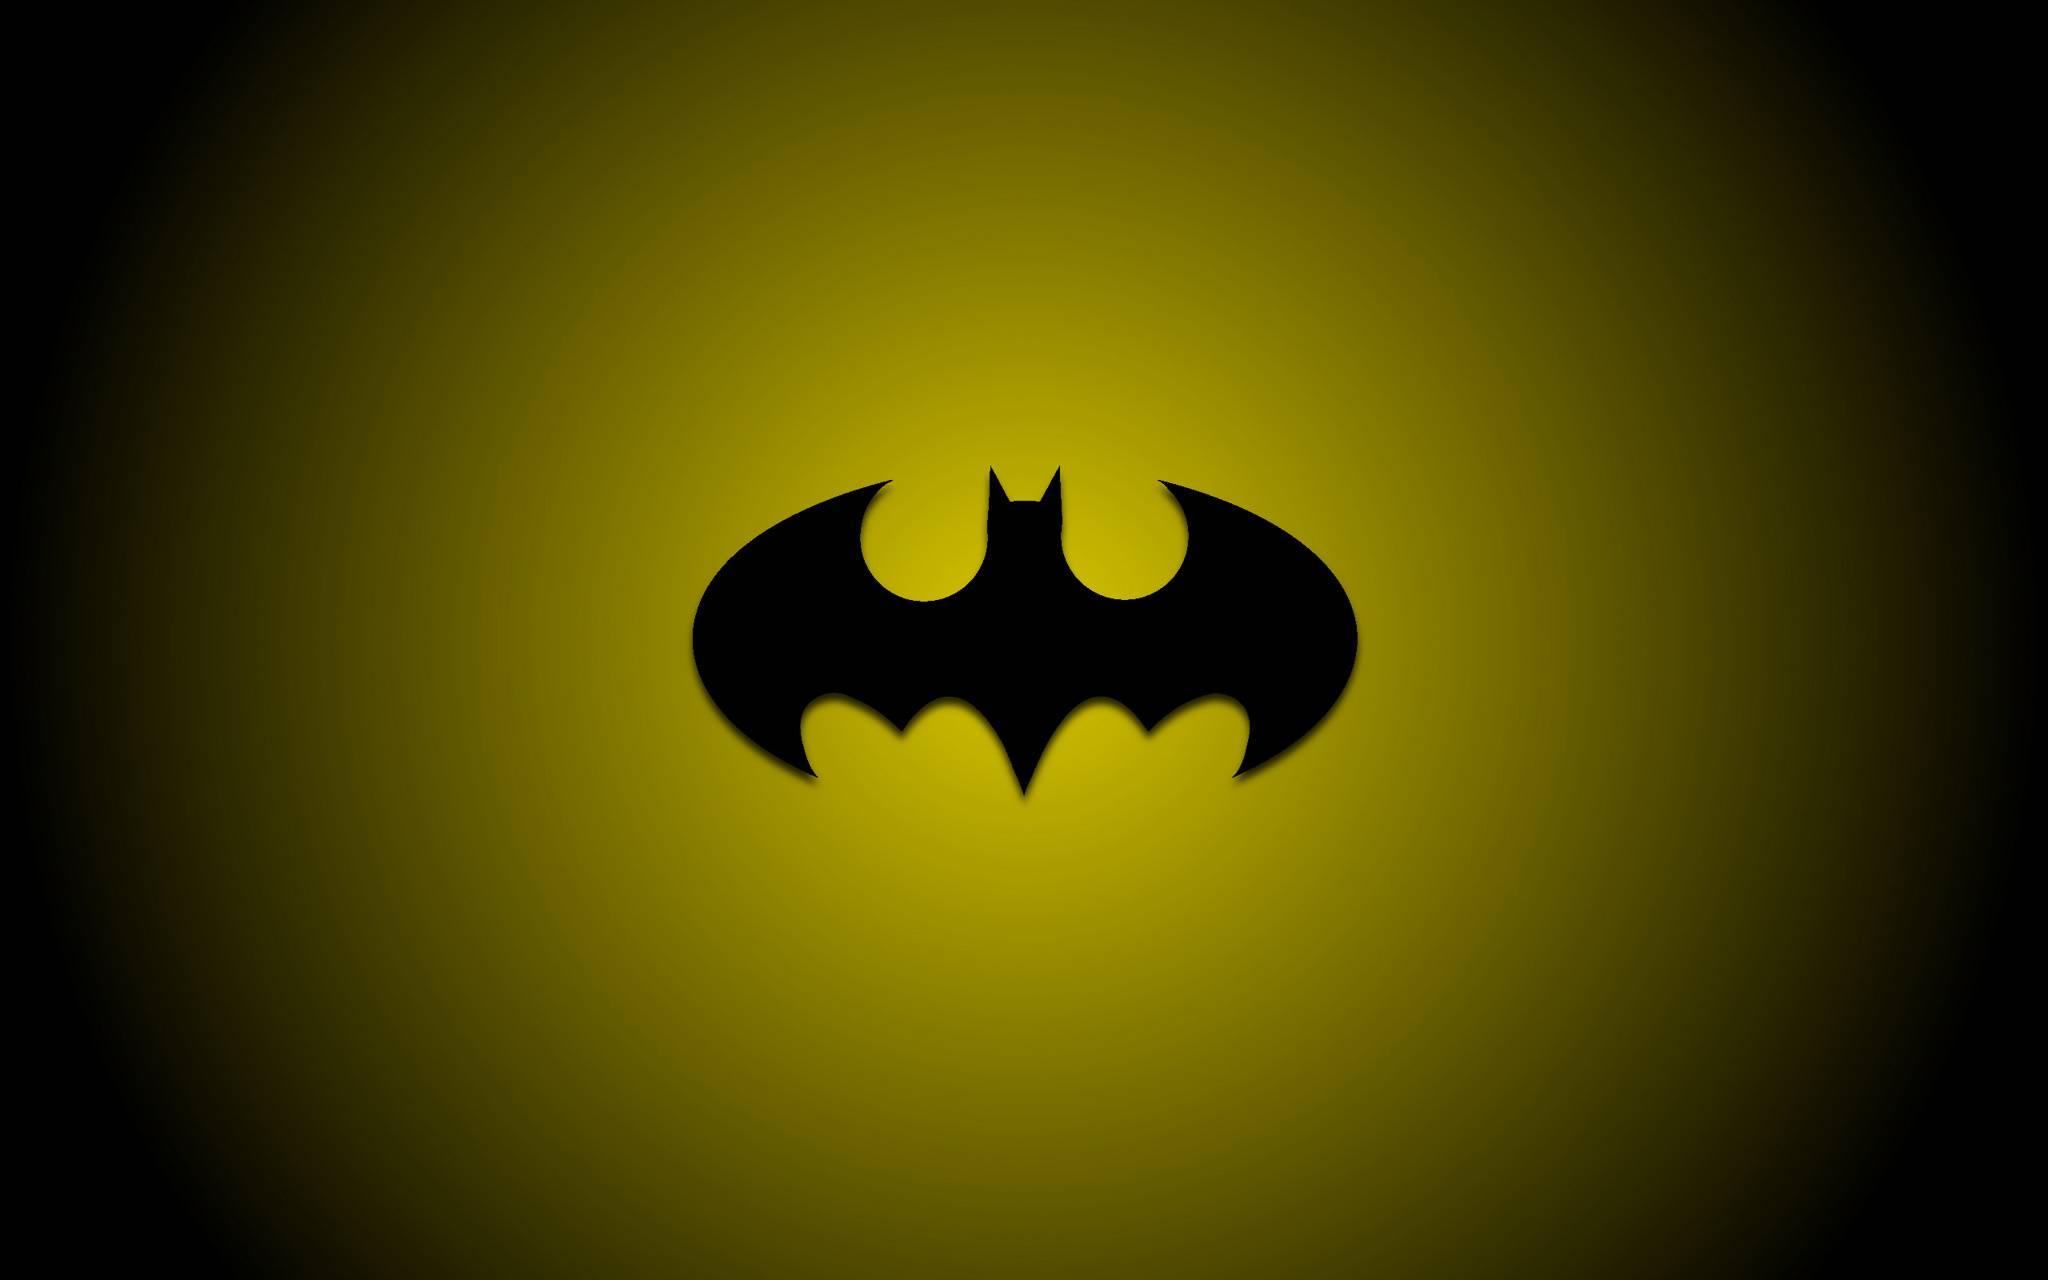 Картинки бэтмена значок бэтмена